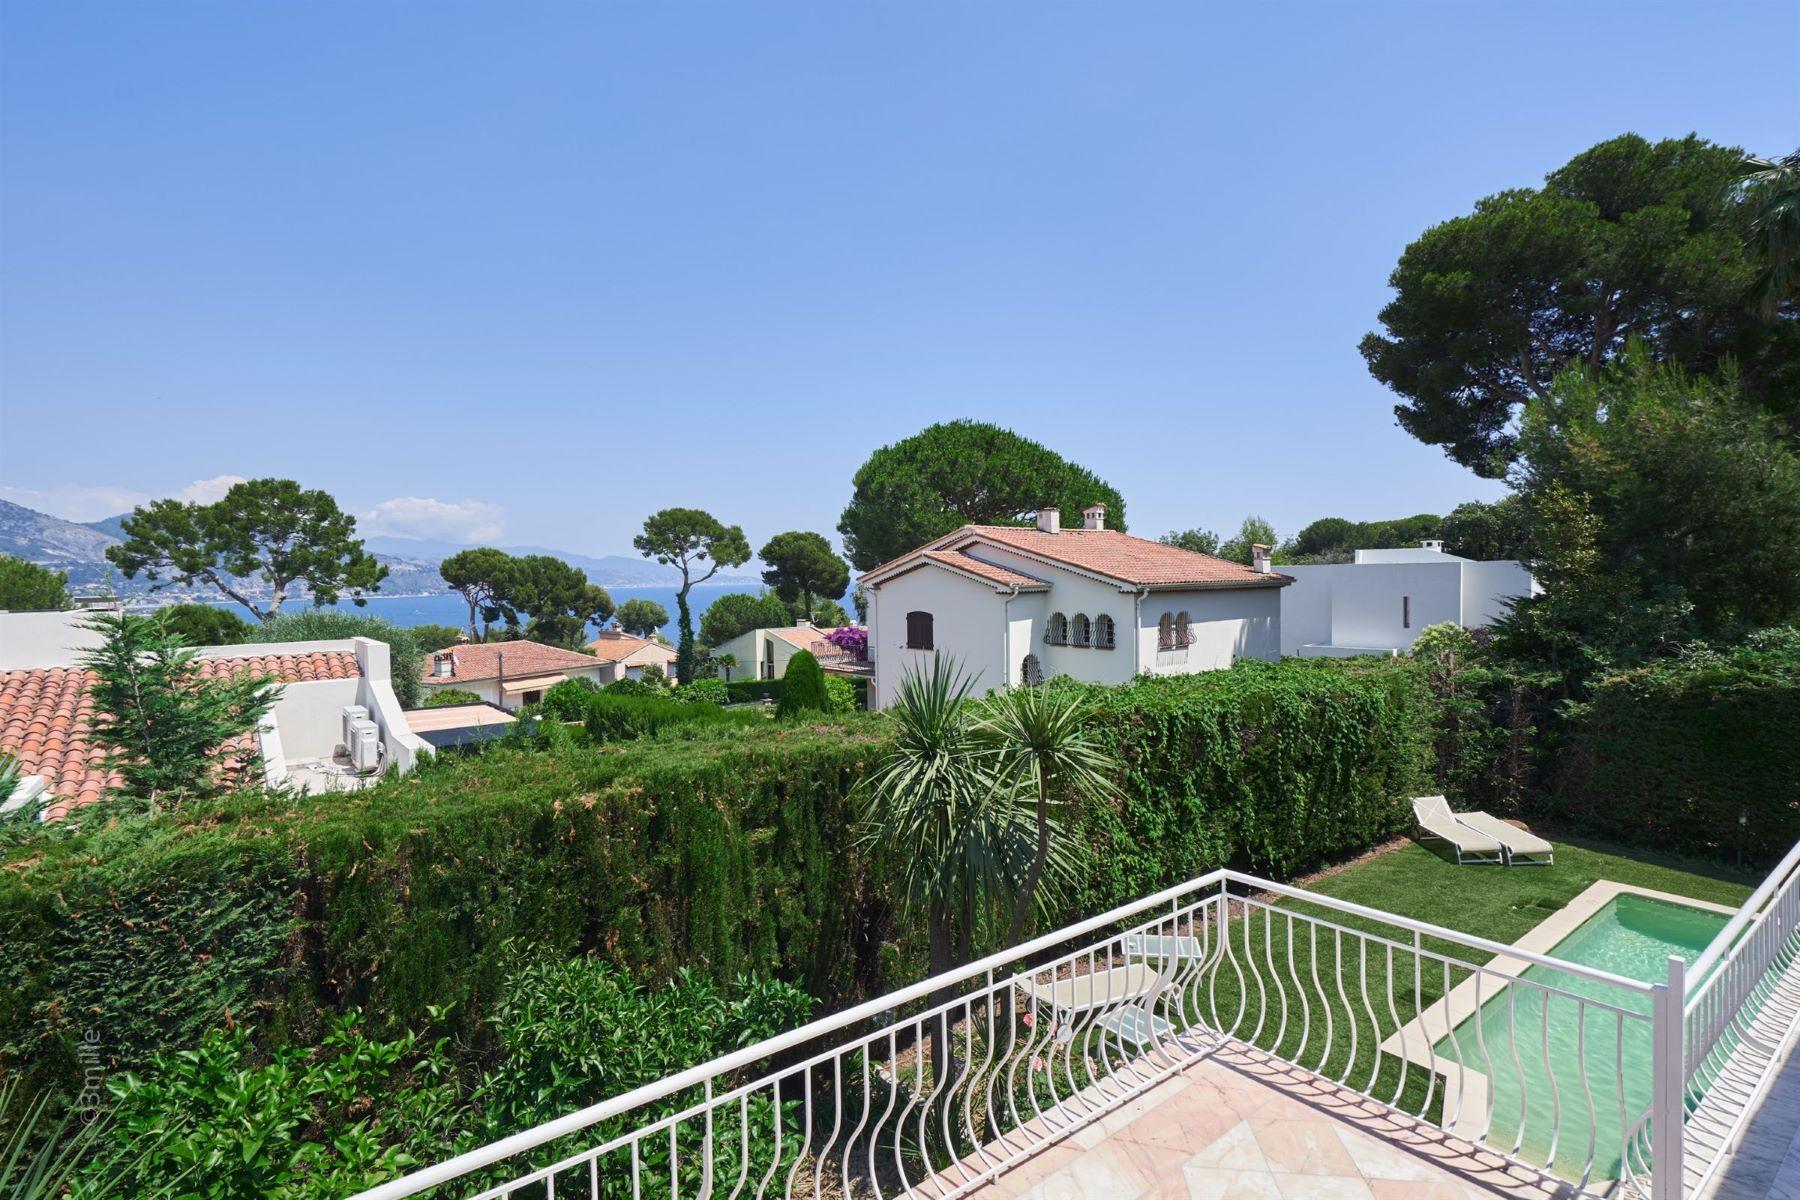 Single Family Homes por un Venta en For sale, property in the heart of Cap-Martin - Next to Monaco - sea view Roquebrune Cap Martin, Provincia - Alpes - Costa Azul 06190 Francia